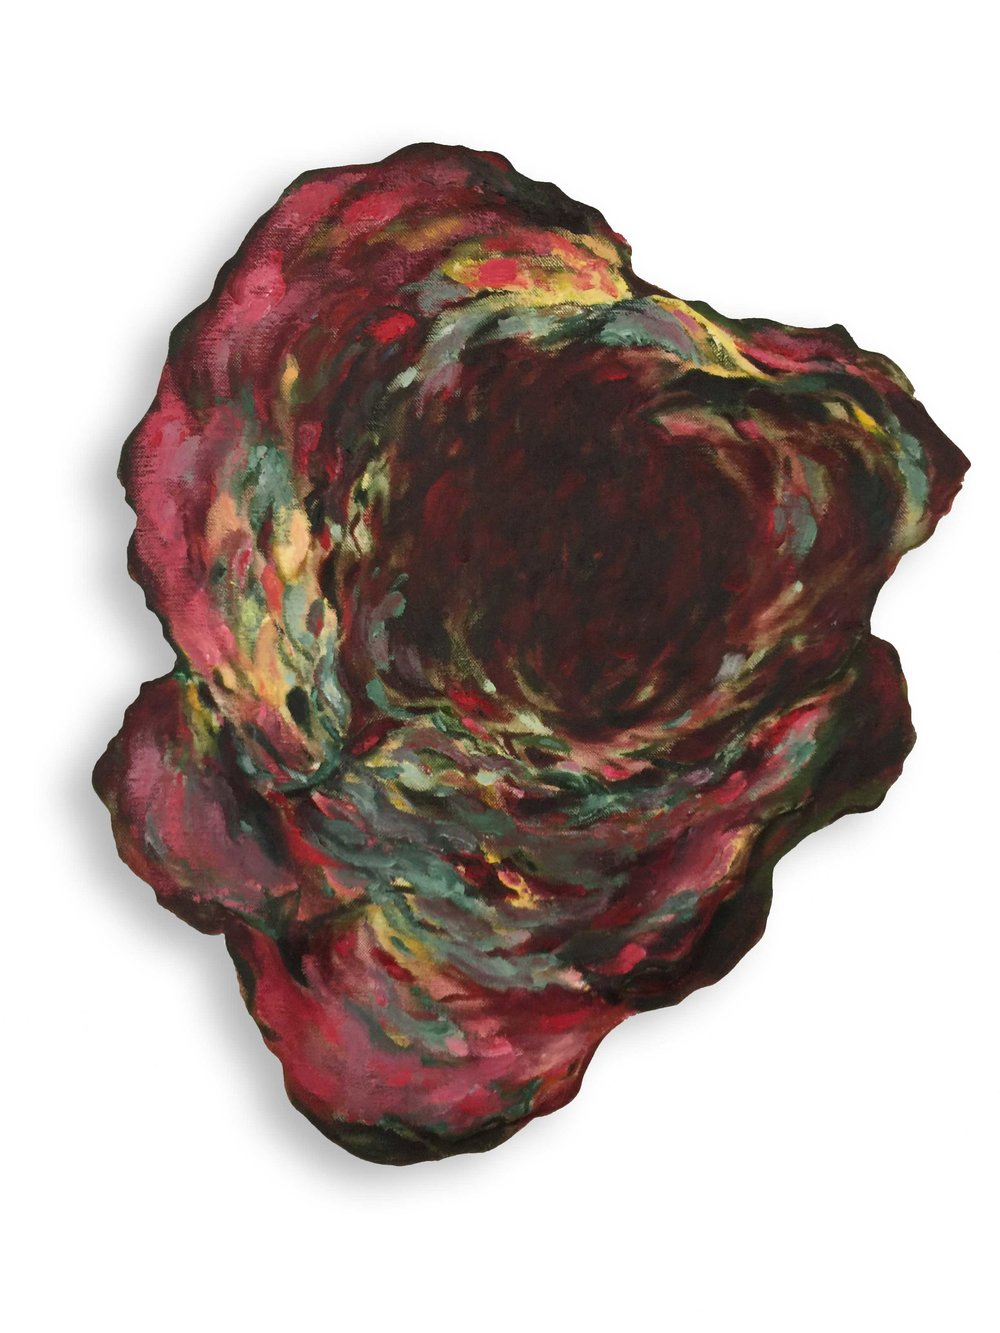 Untitled (Cranberry)